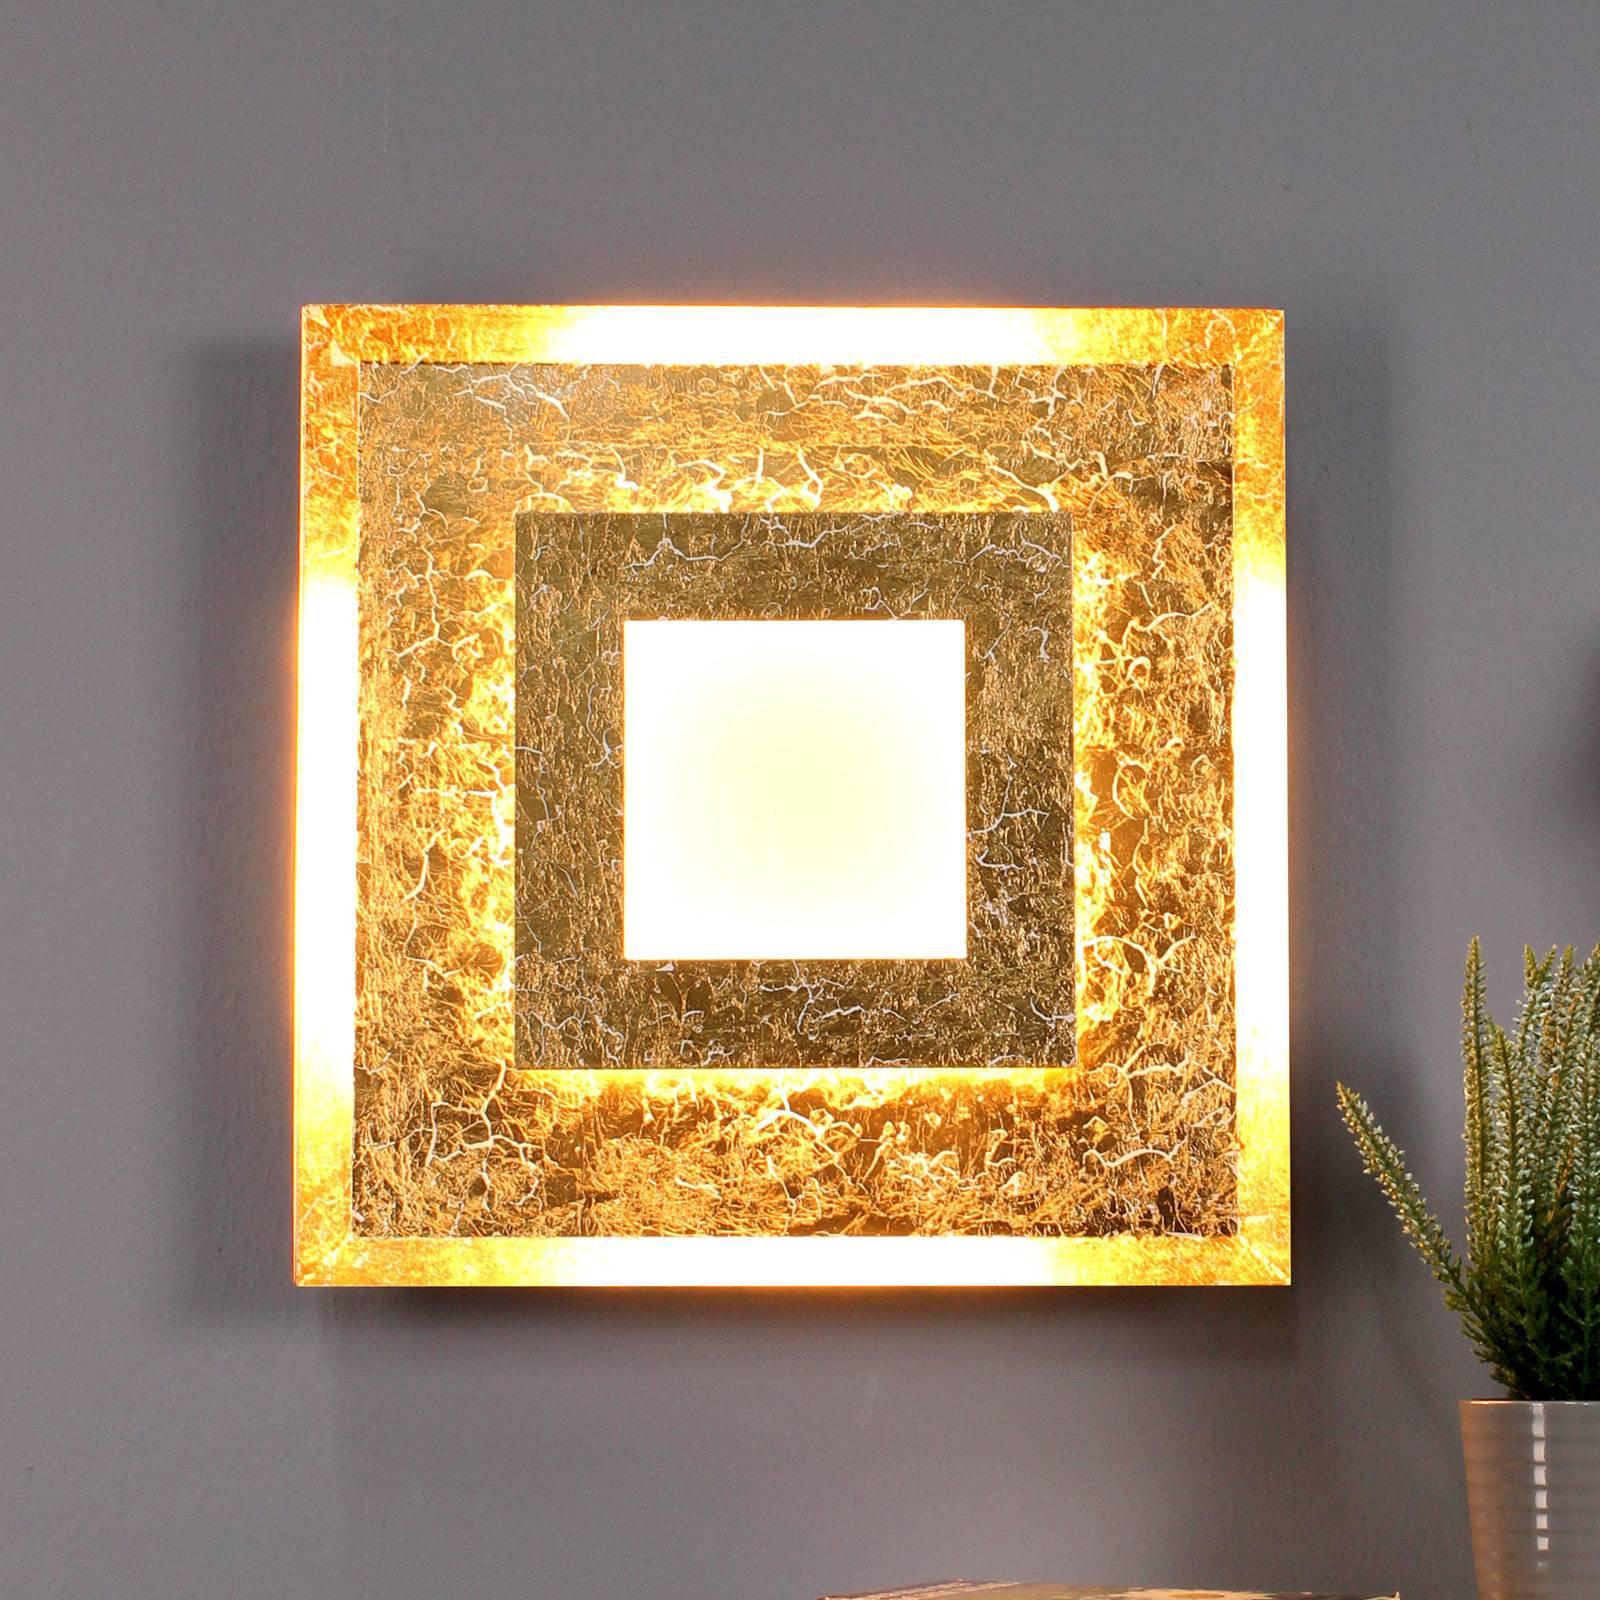 LED-vegglampe Window 39x39 cm, gull